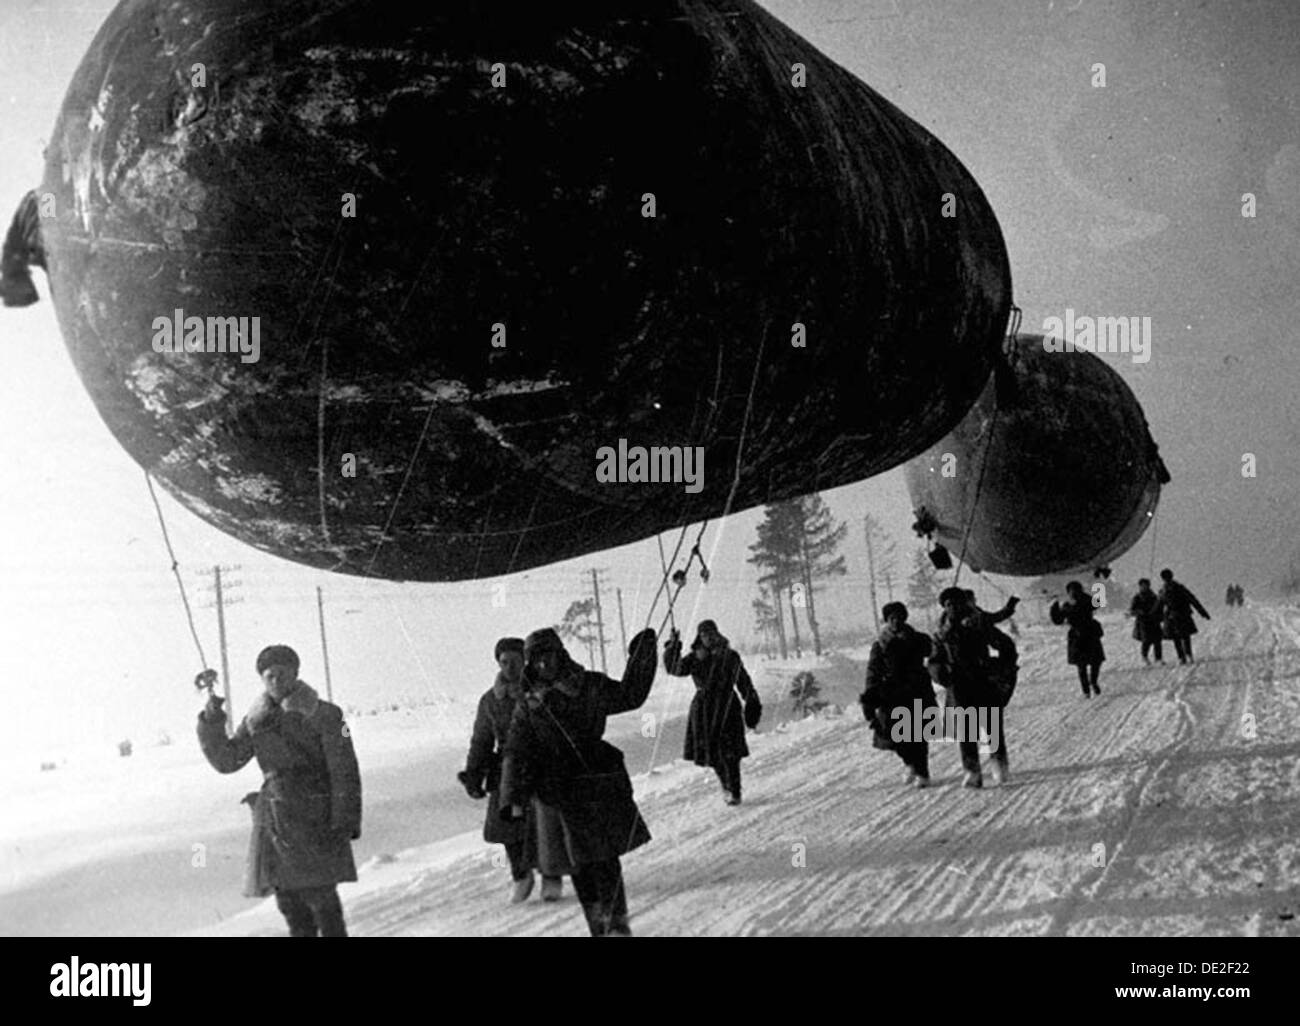 Barrage balloons near Moscow, USSR, World War II, 1941 - Stock Image